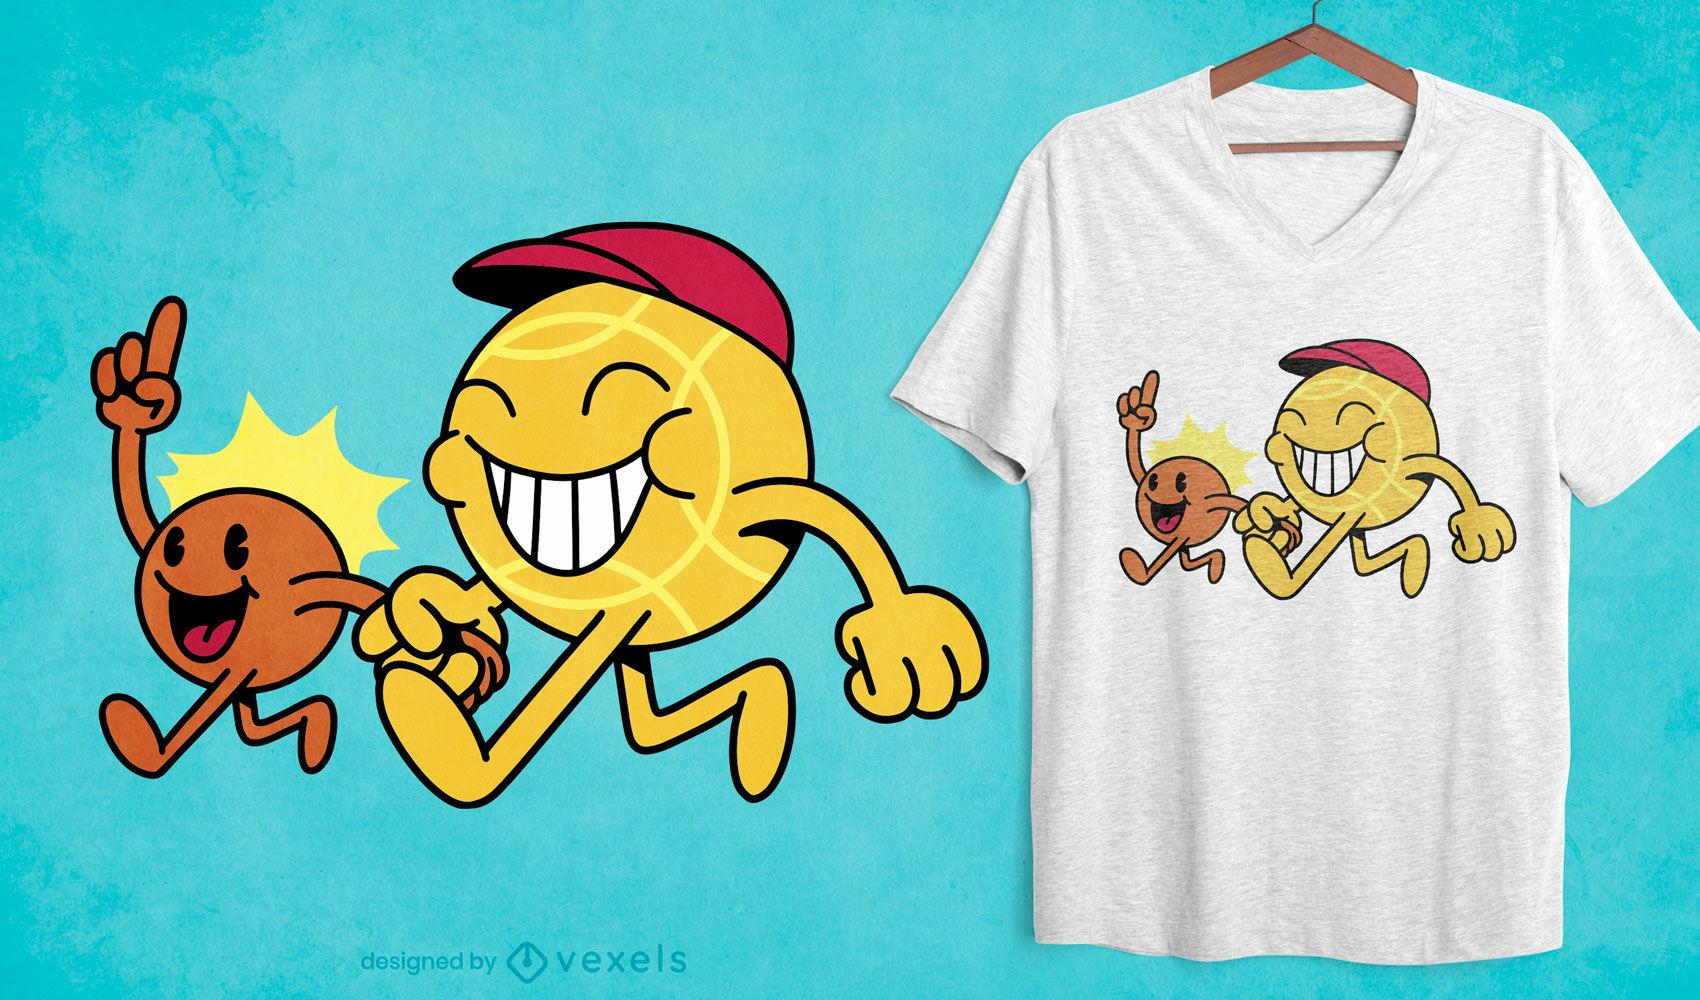 Petanque French cartoon t-shirt design